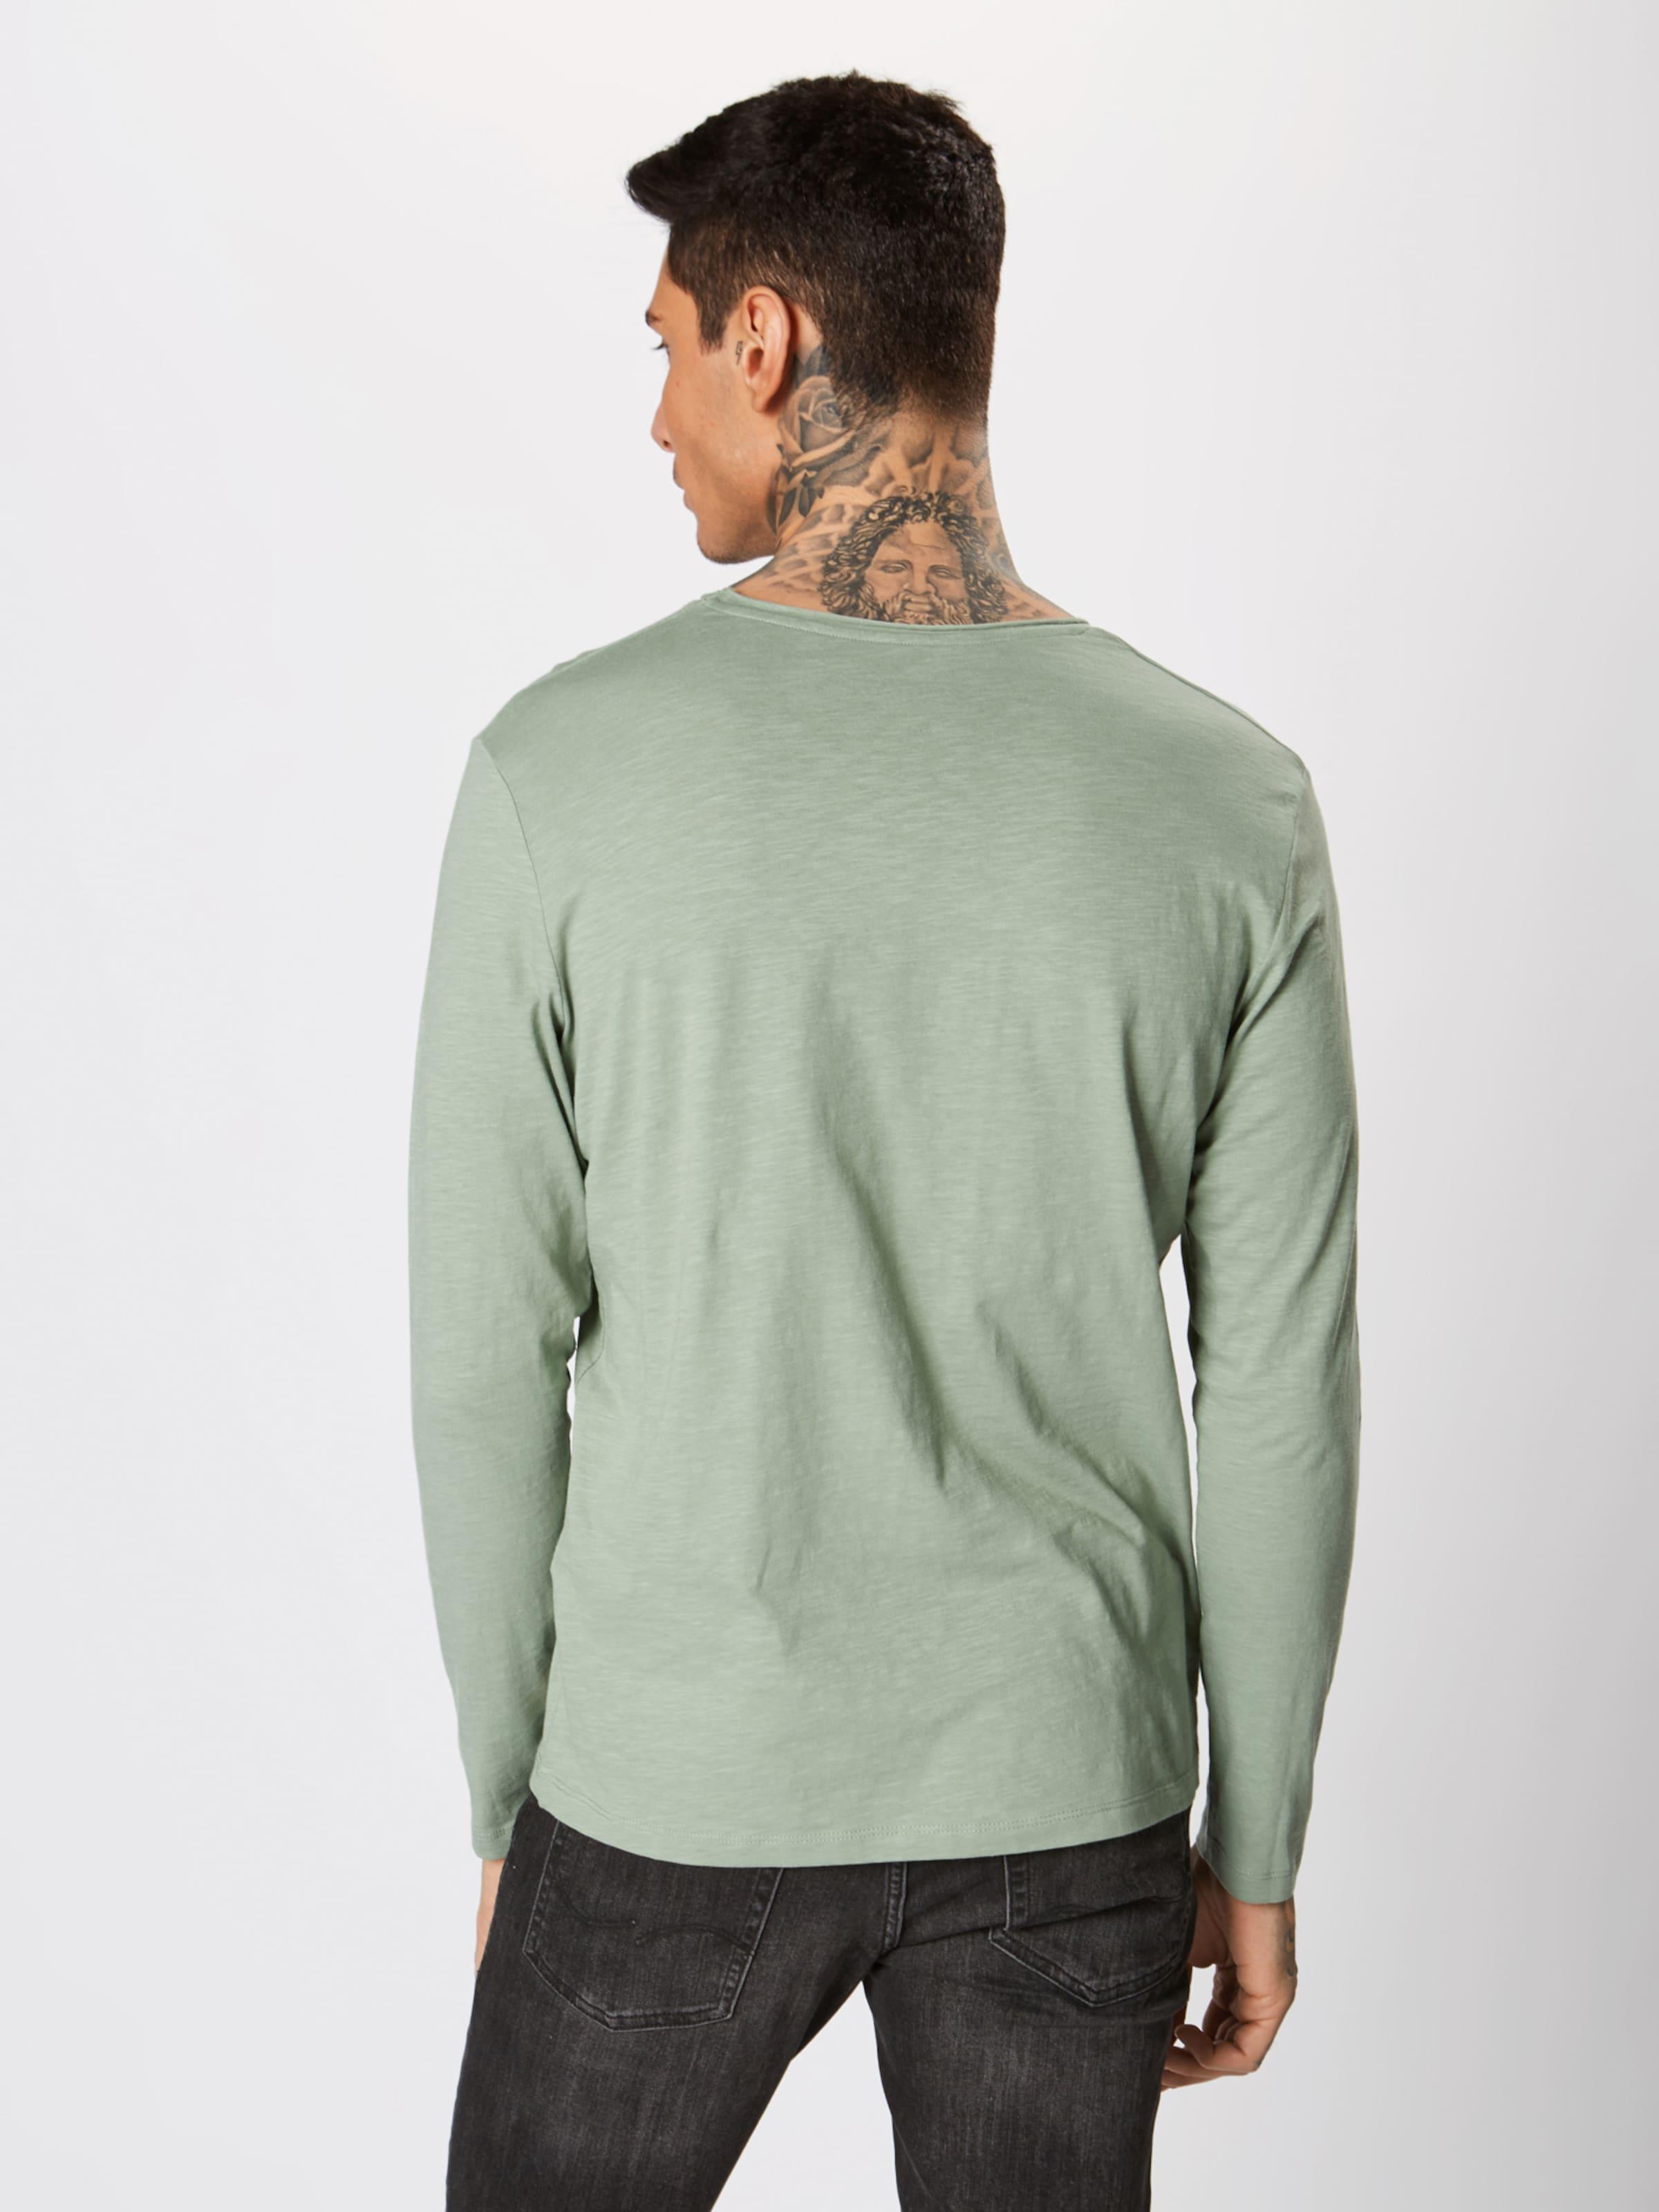 In Hellgrün 'jorbirch' Jones Shirt Jackamp; hrsdxCtQ